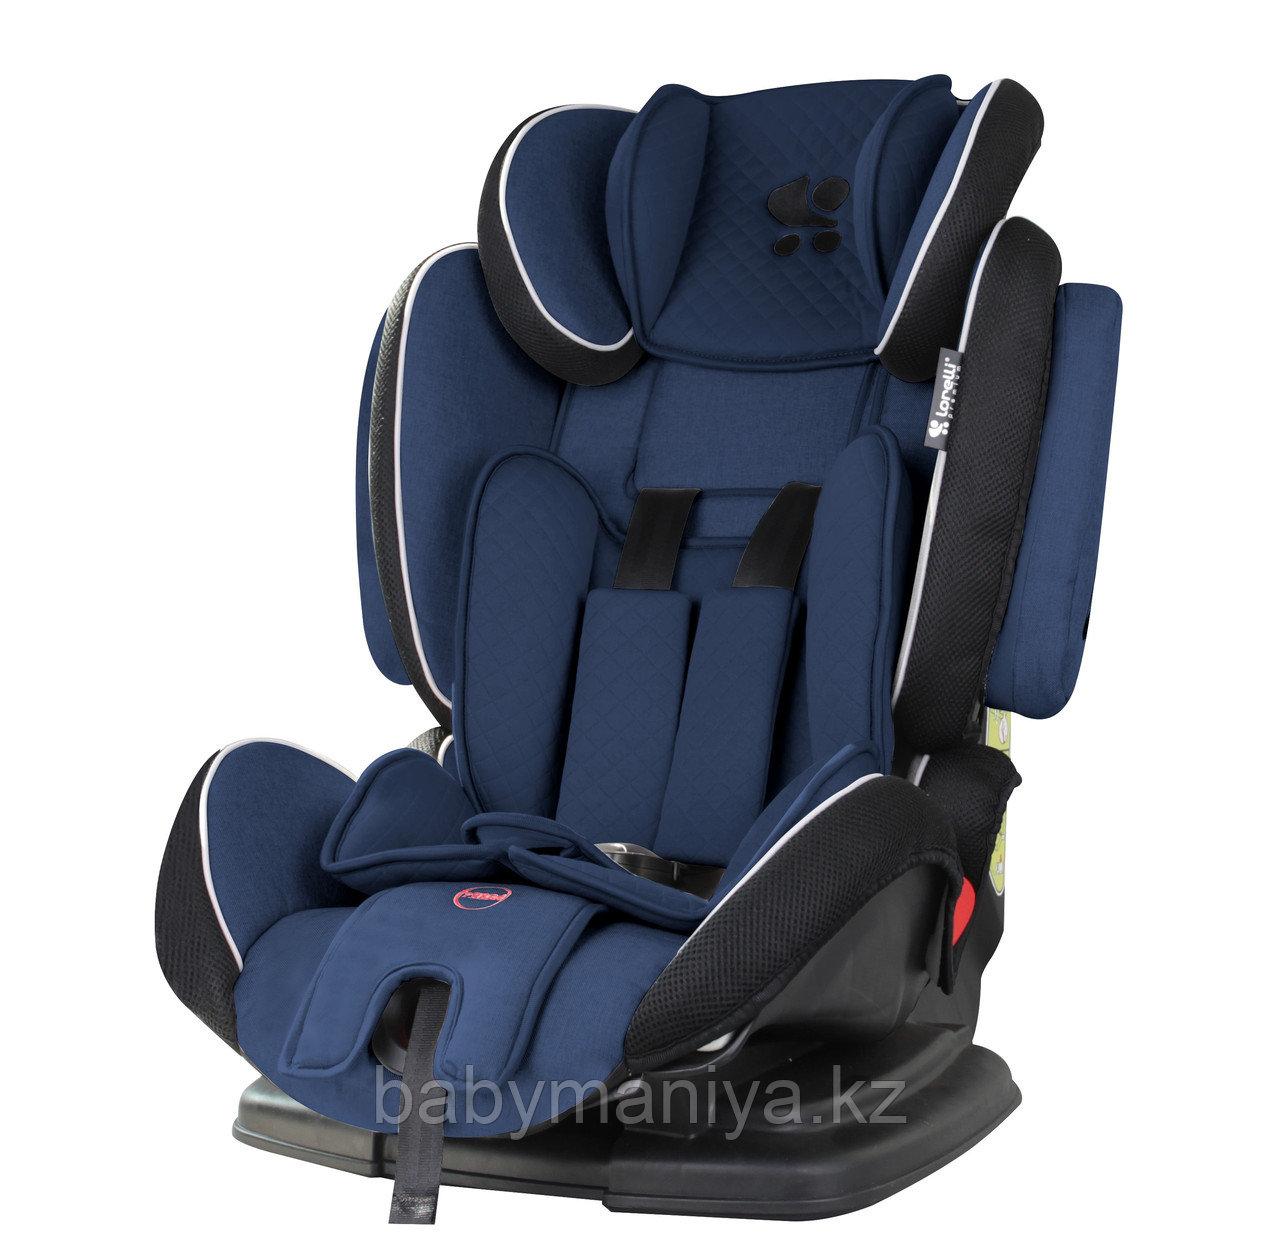 Автокресло Lorelli Magic Premium 9-36 кг Синий / Blue 1842